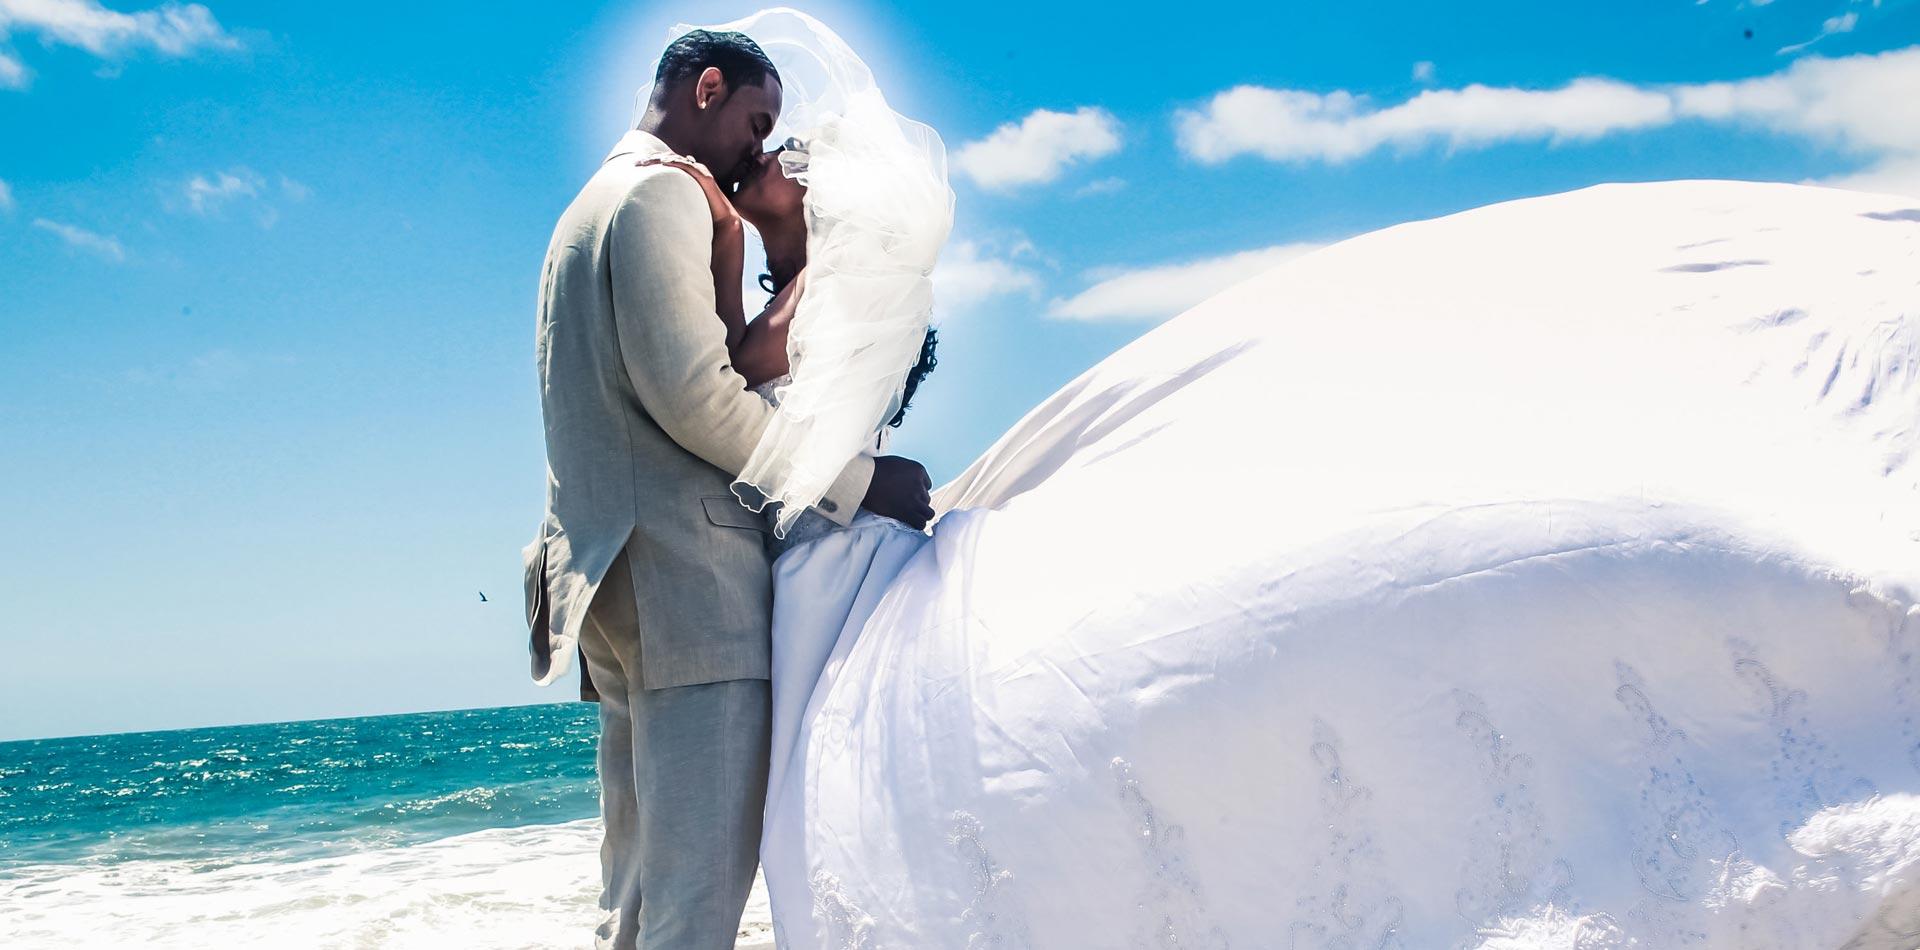 slider4_weddingbeach